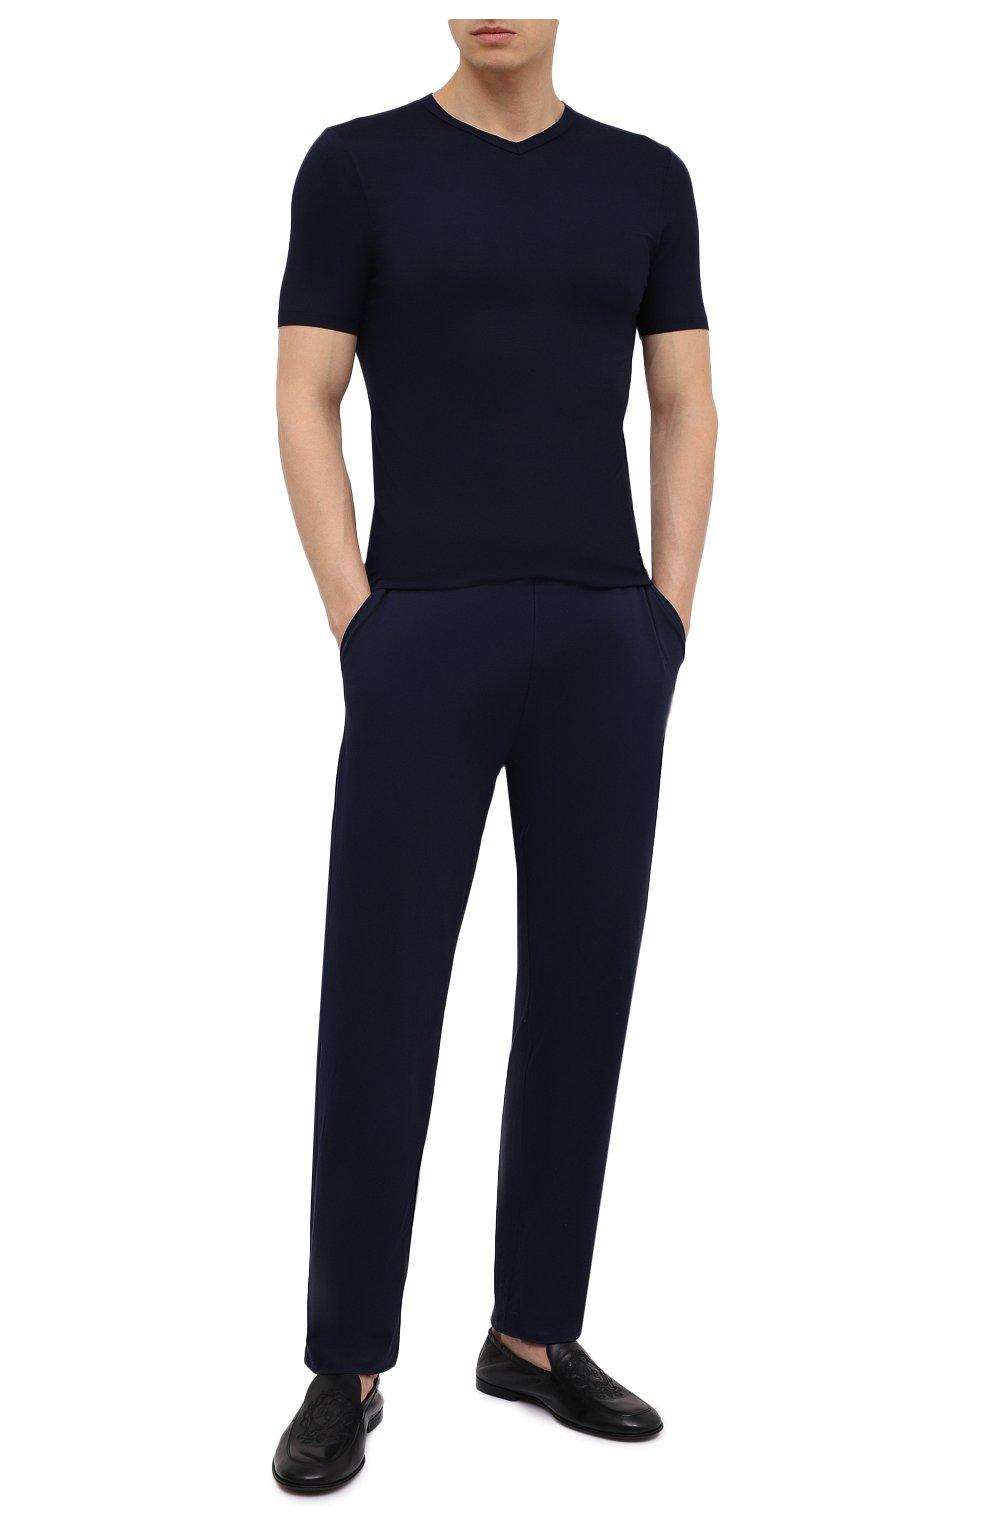 Мужская футболка ZIMMERLI темно-синего цвета, арт. 700-1346 | Фото 2 (Кросс-КТ: домашняя одежда; Рукава: Короткие; Материал внешний: Синтетический материал; Длина (для топов): Стандартные; Мужское Кросс-КТ: Футболка-белье)